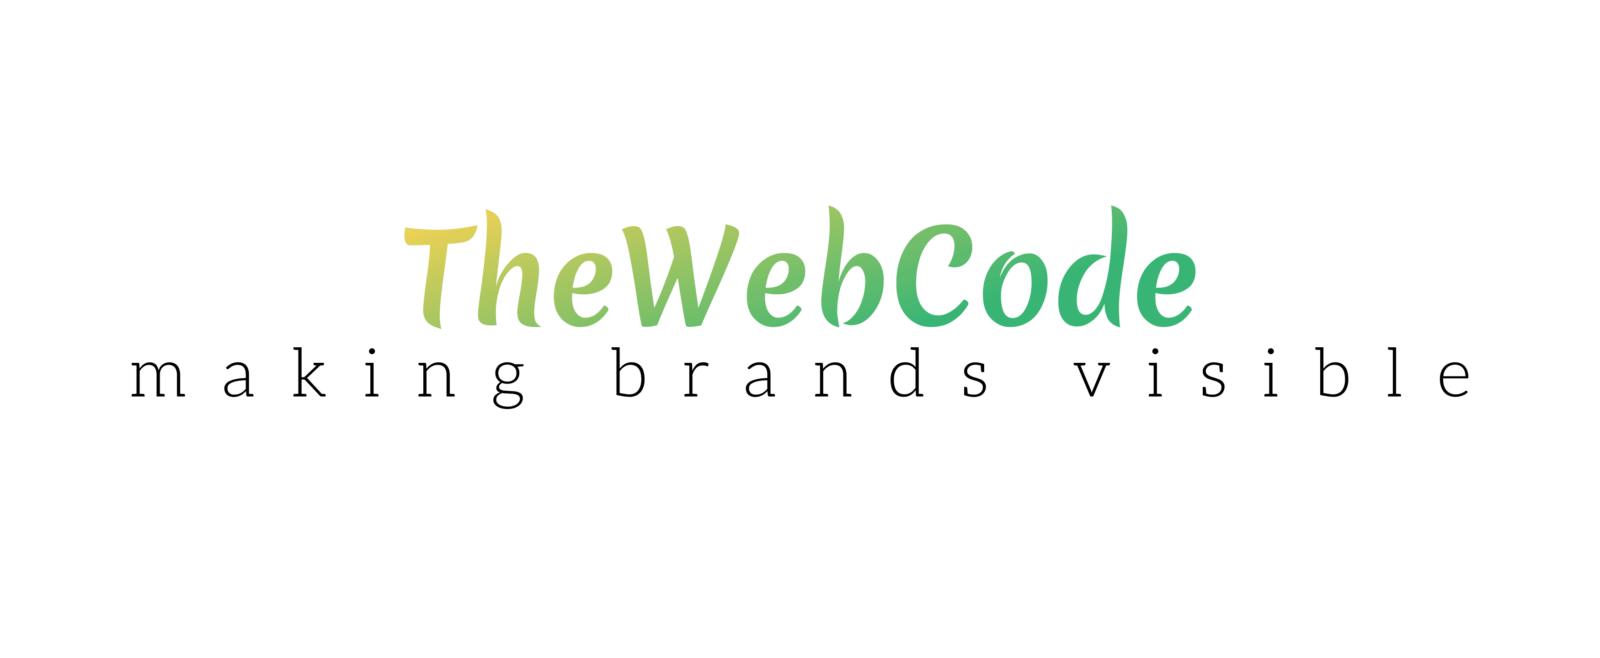 the web code logo